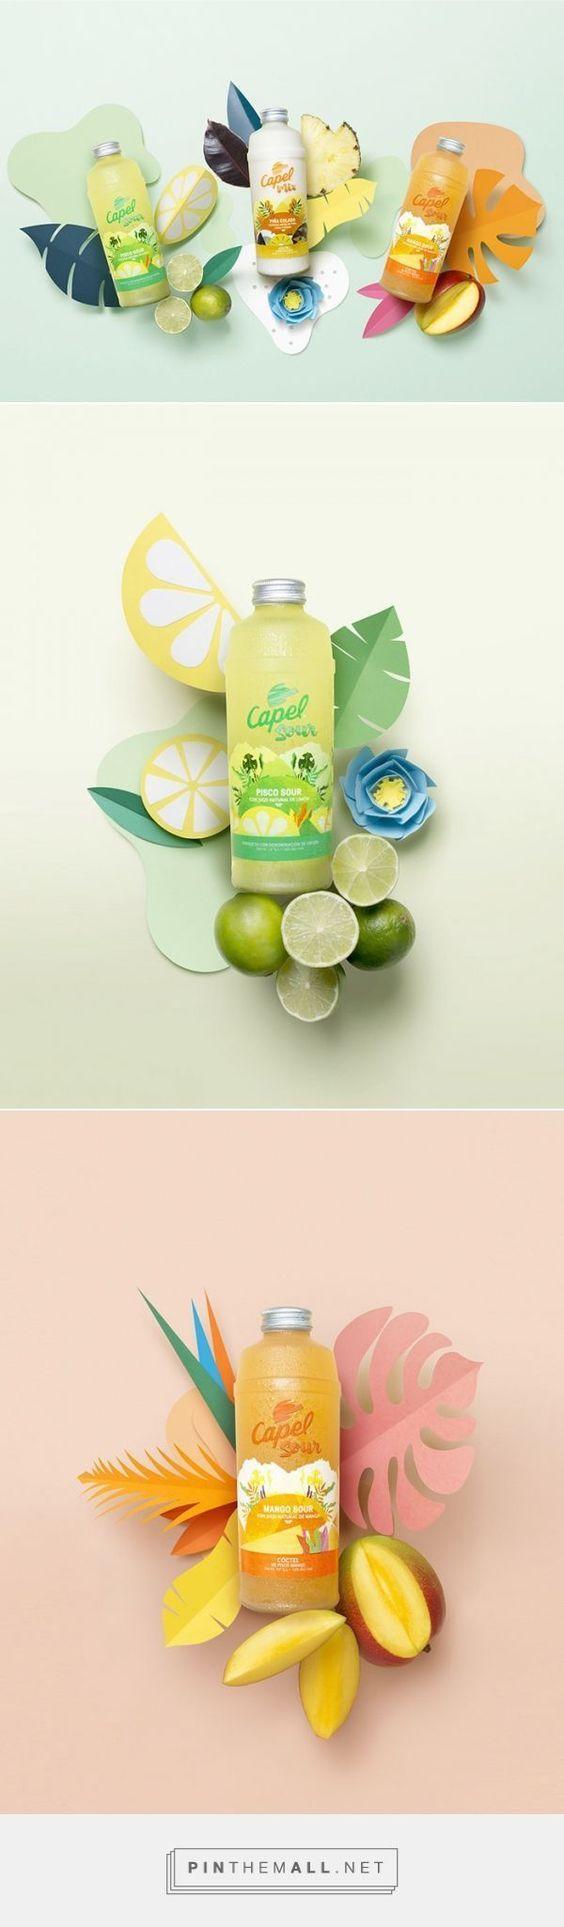 Capel Sour juices by Estudio Cielo. Source: Daily Package Design Inspiration.: